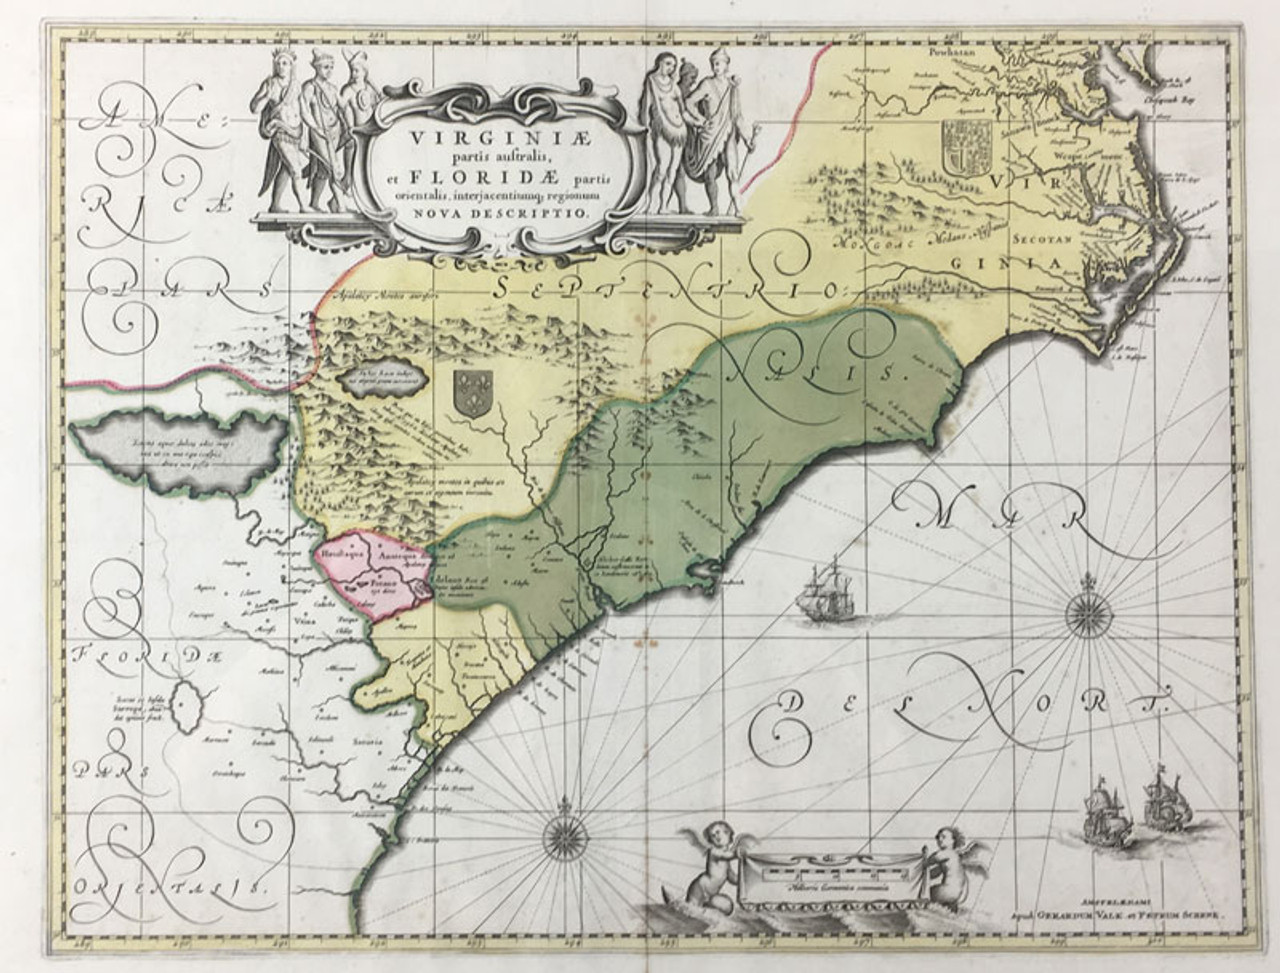 Virginie et Floridae Partis Orientalis Nova Descripto